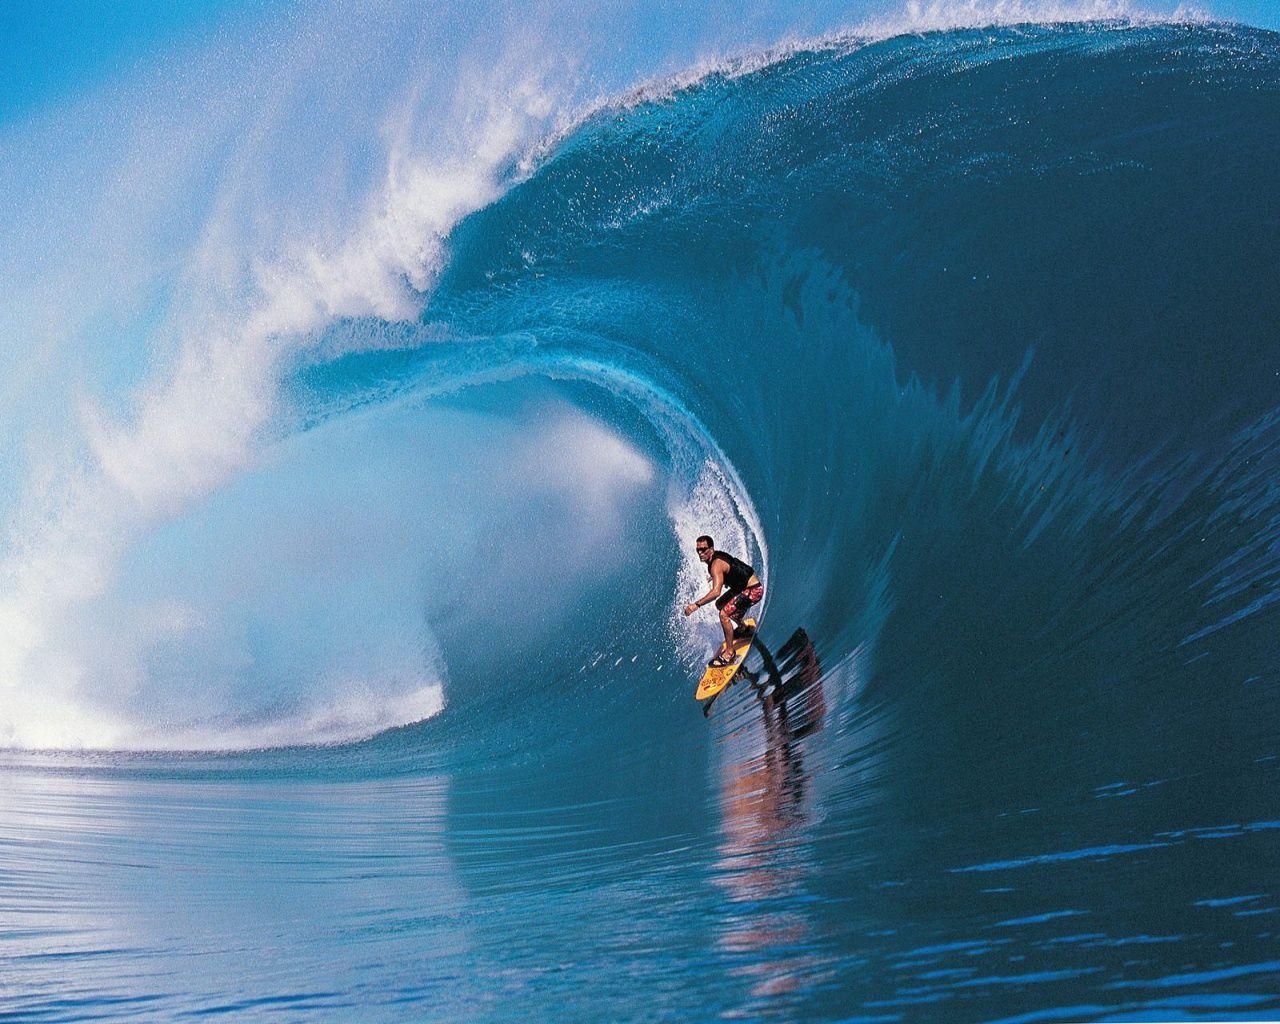 Surfing Big Waves Wallpaper Big Wave Wallpaper Hd Surfing